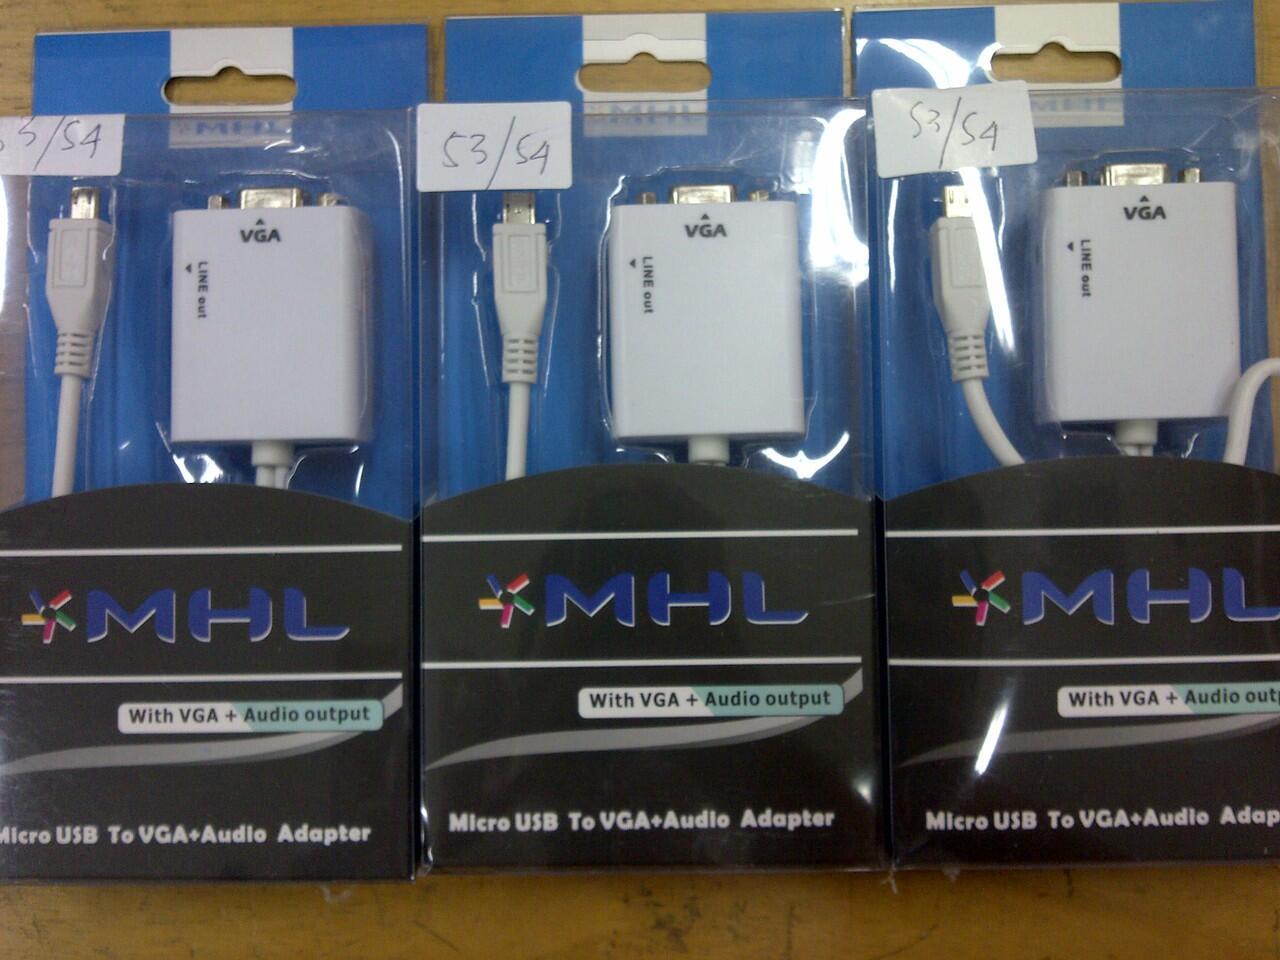 KABEL MHL VGA S2,S3,S4,NOTE8,CABLE MICRO USB-VGA,MIKRO USB TO PROYEKTOR LCD MONITOR